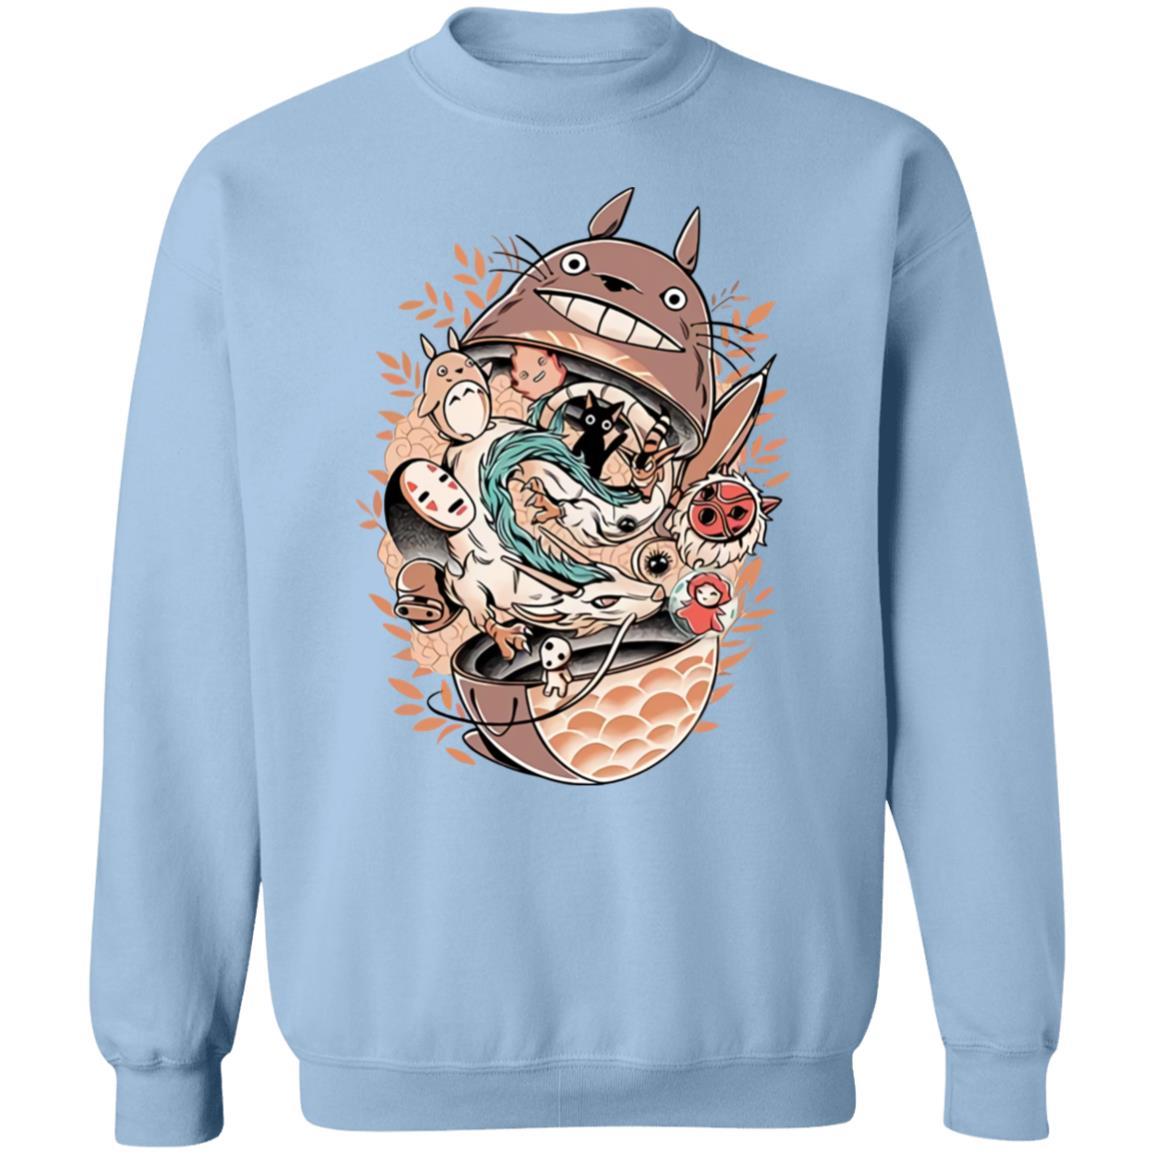 Totoro Daruma and Ghibli Friends Sweatshirt